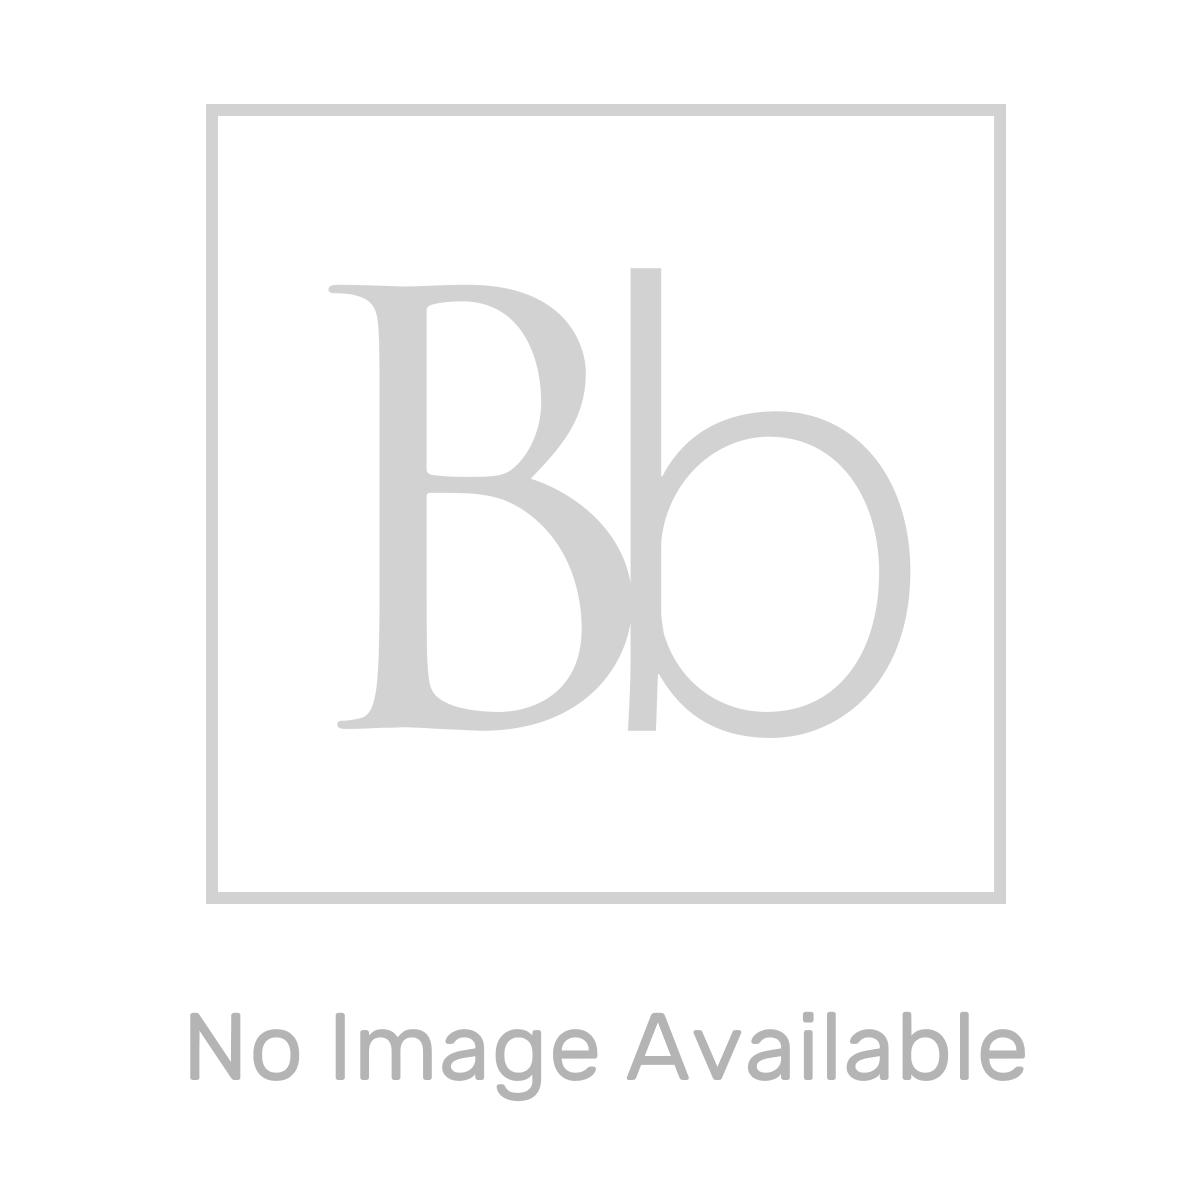 Aquadart Rolla 8 Sliding Shower Enclosure Wet Room Configuration